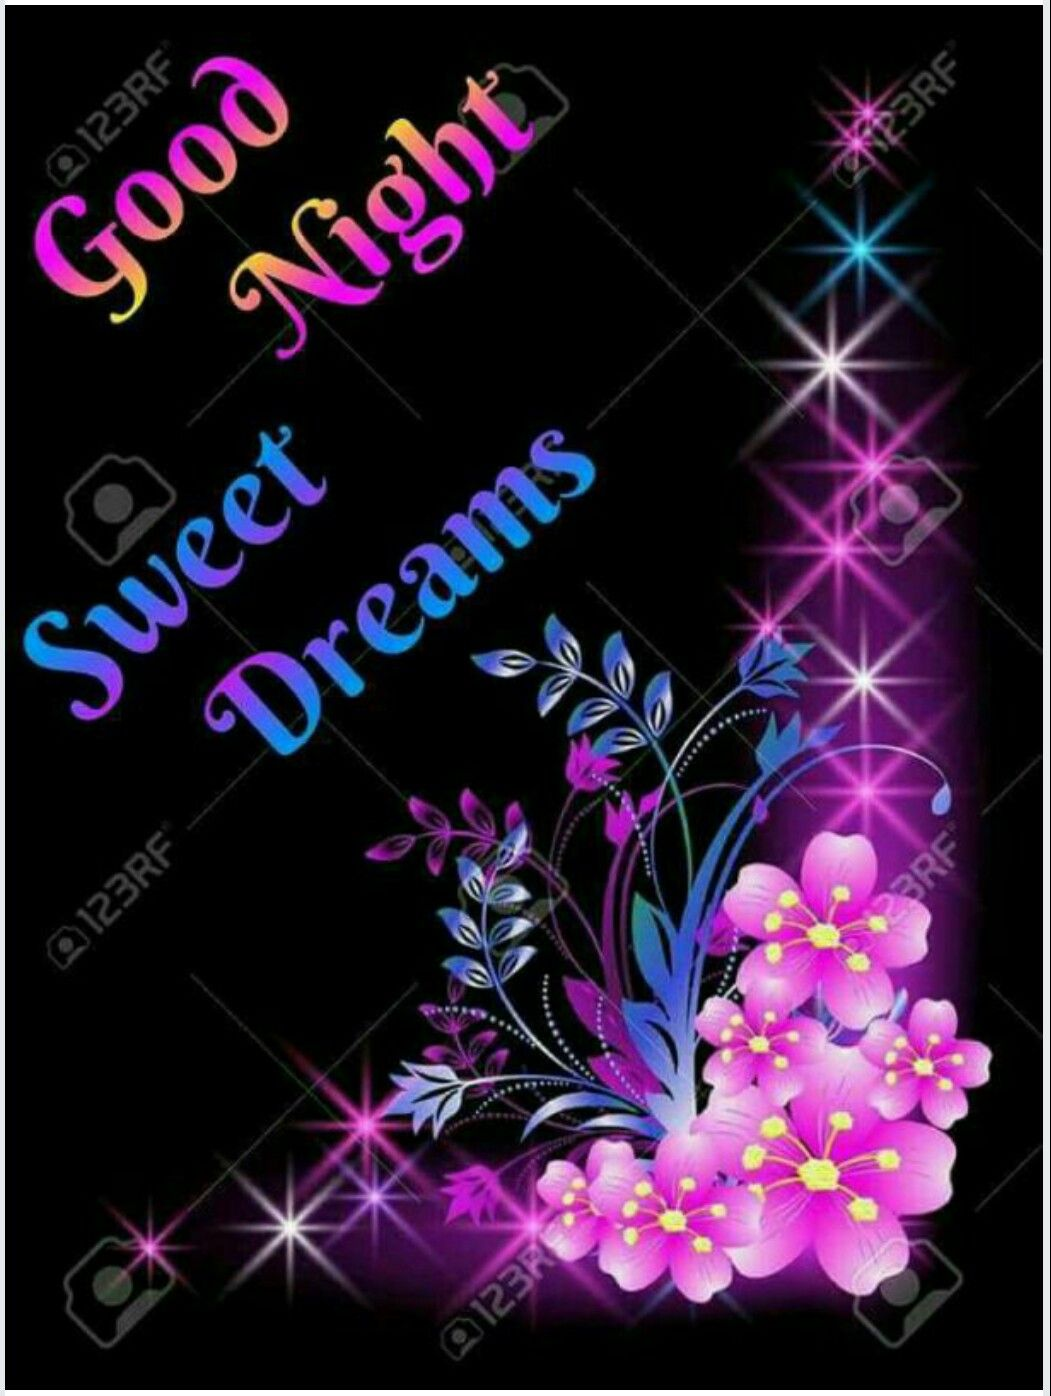 Good Night! Sweet Dreams    gud morning sunshine   Good